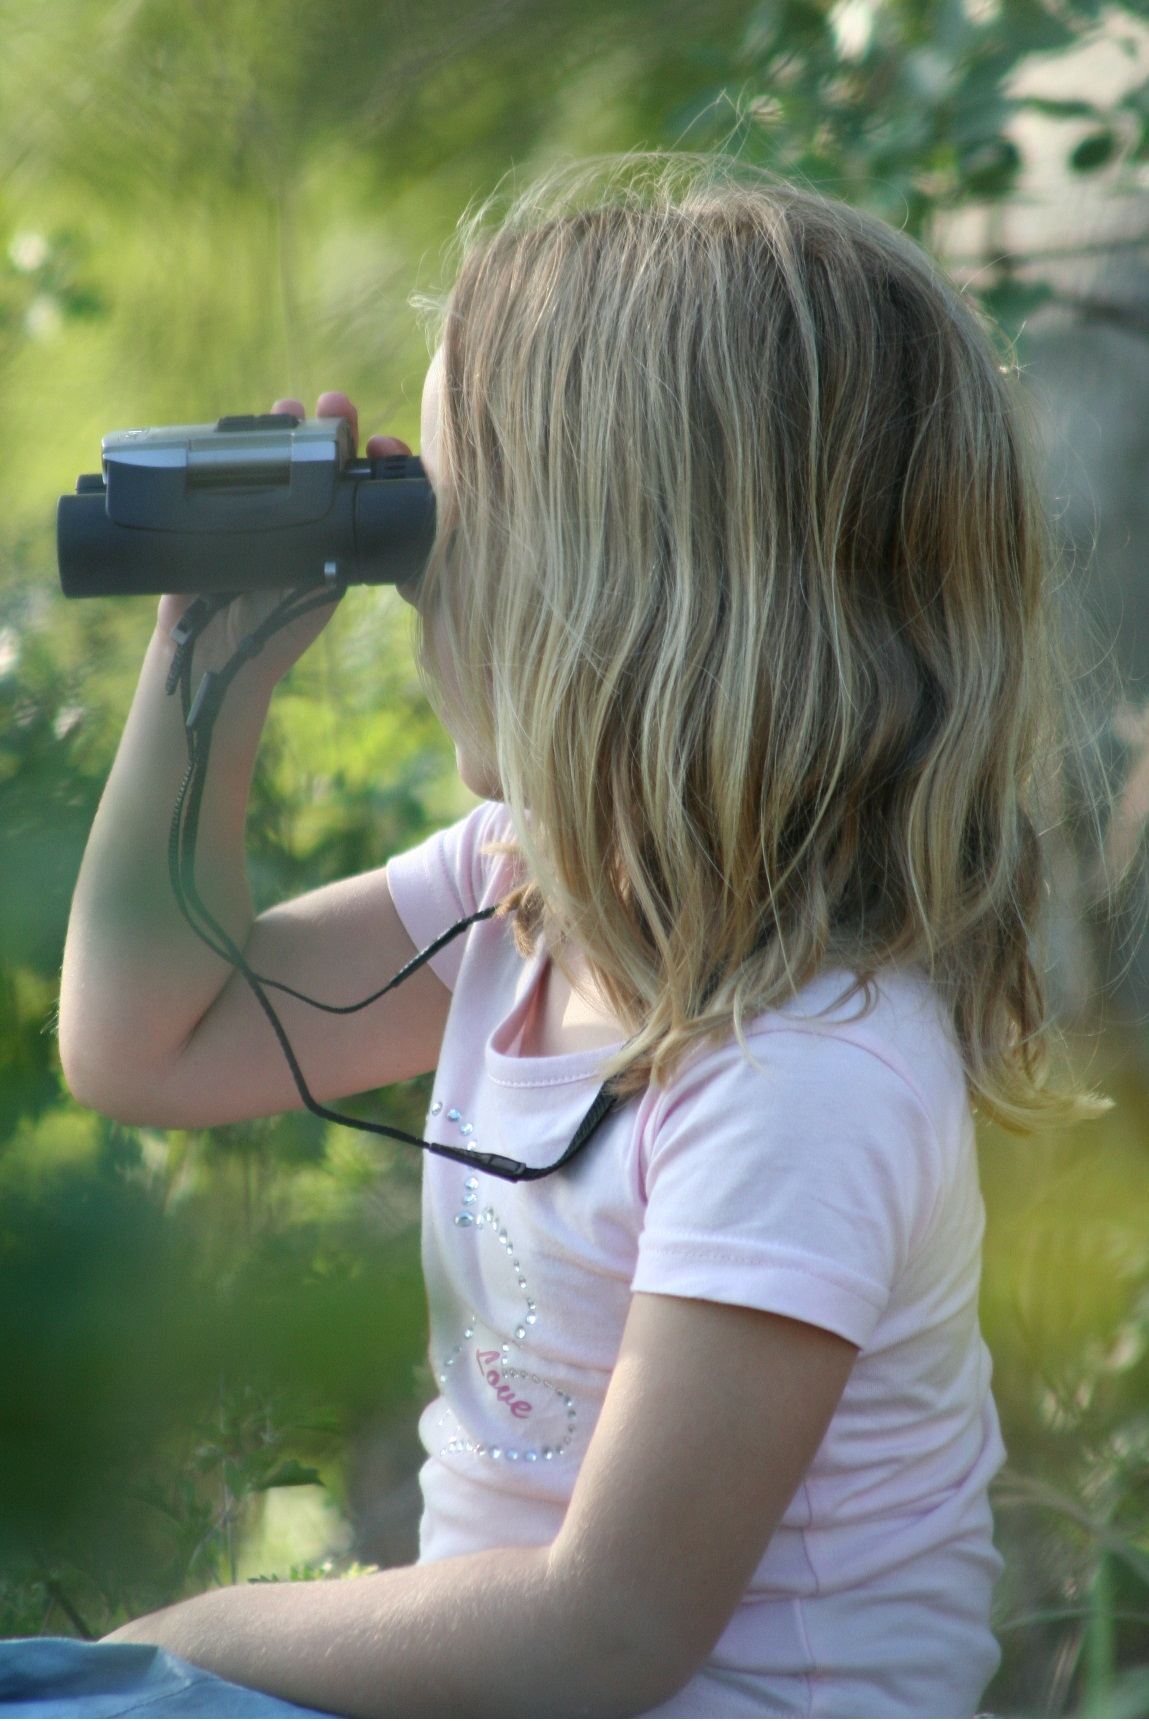 Shanay binoculars